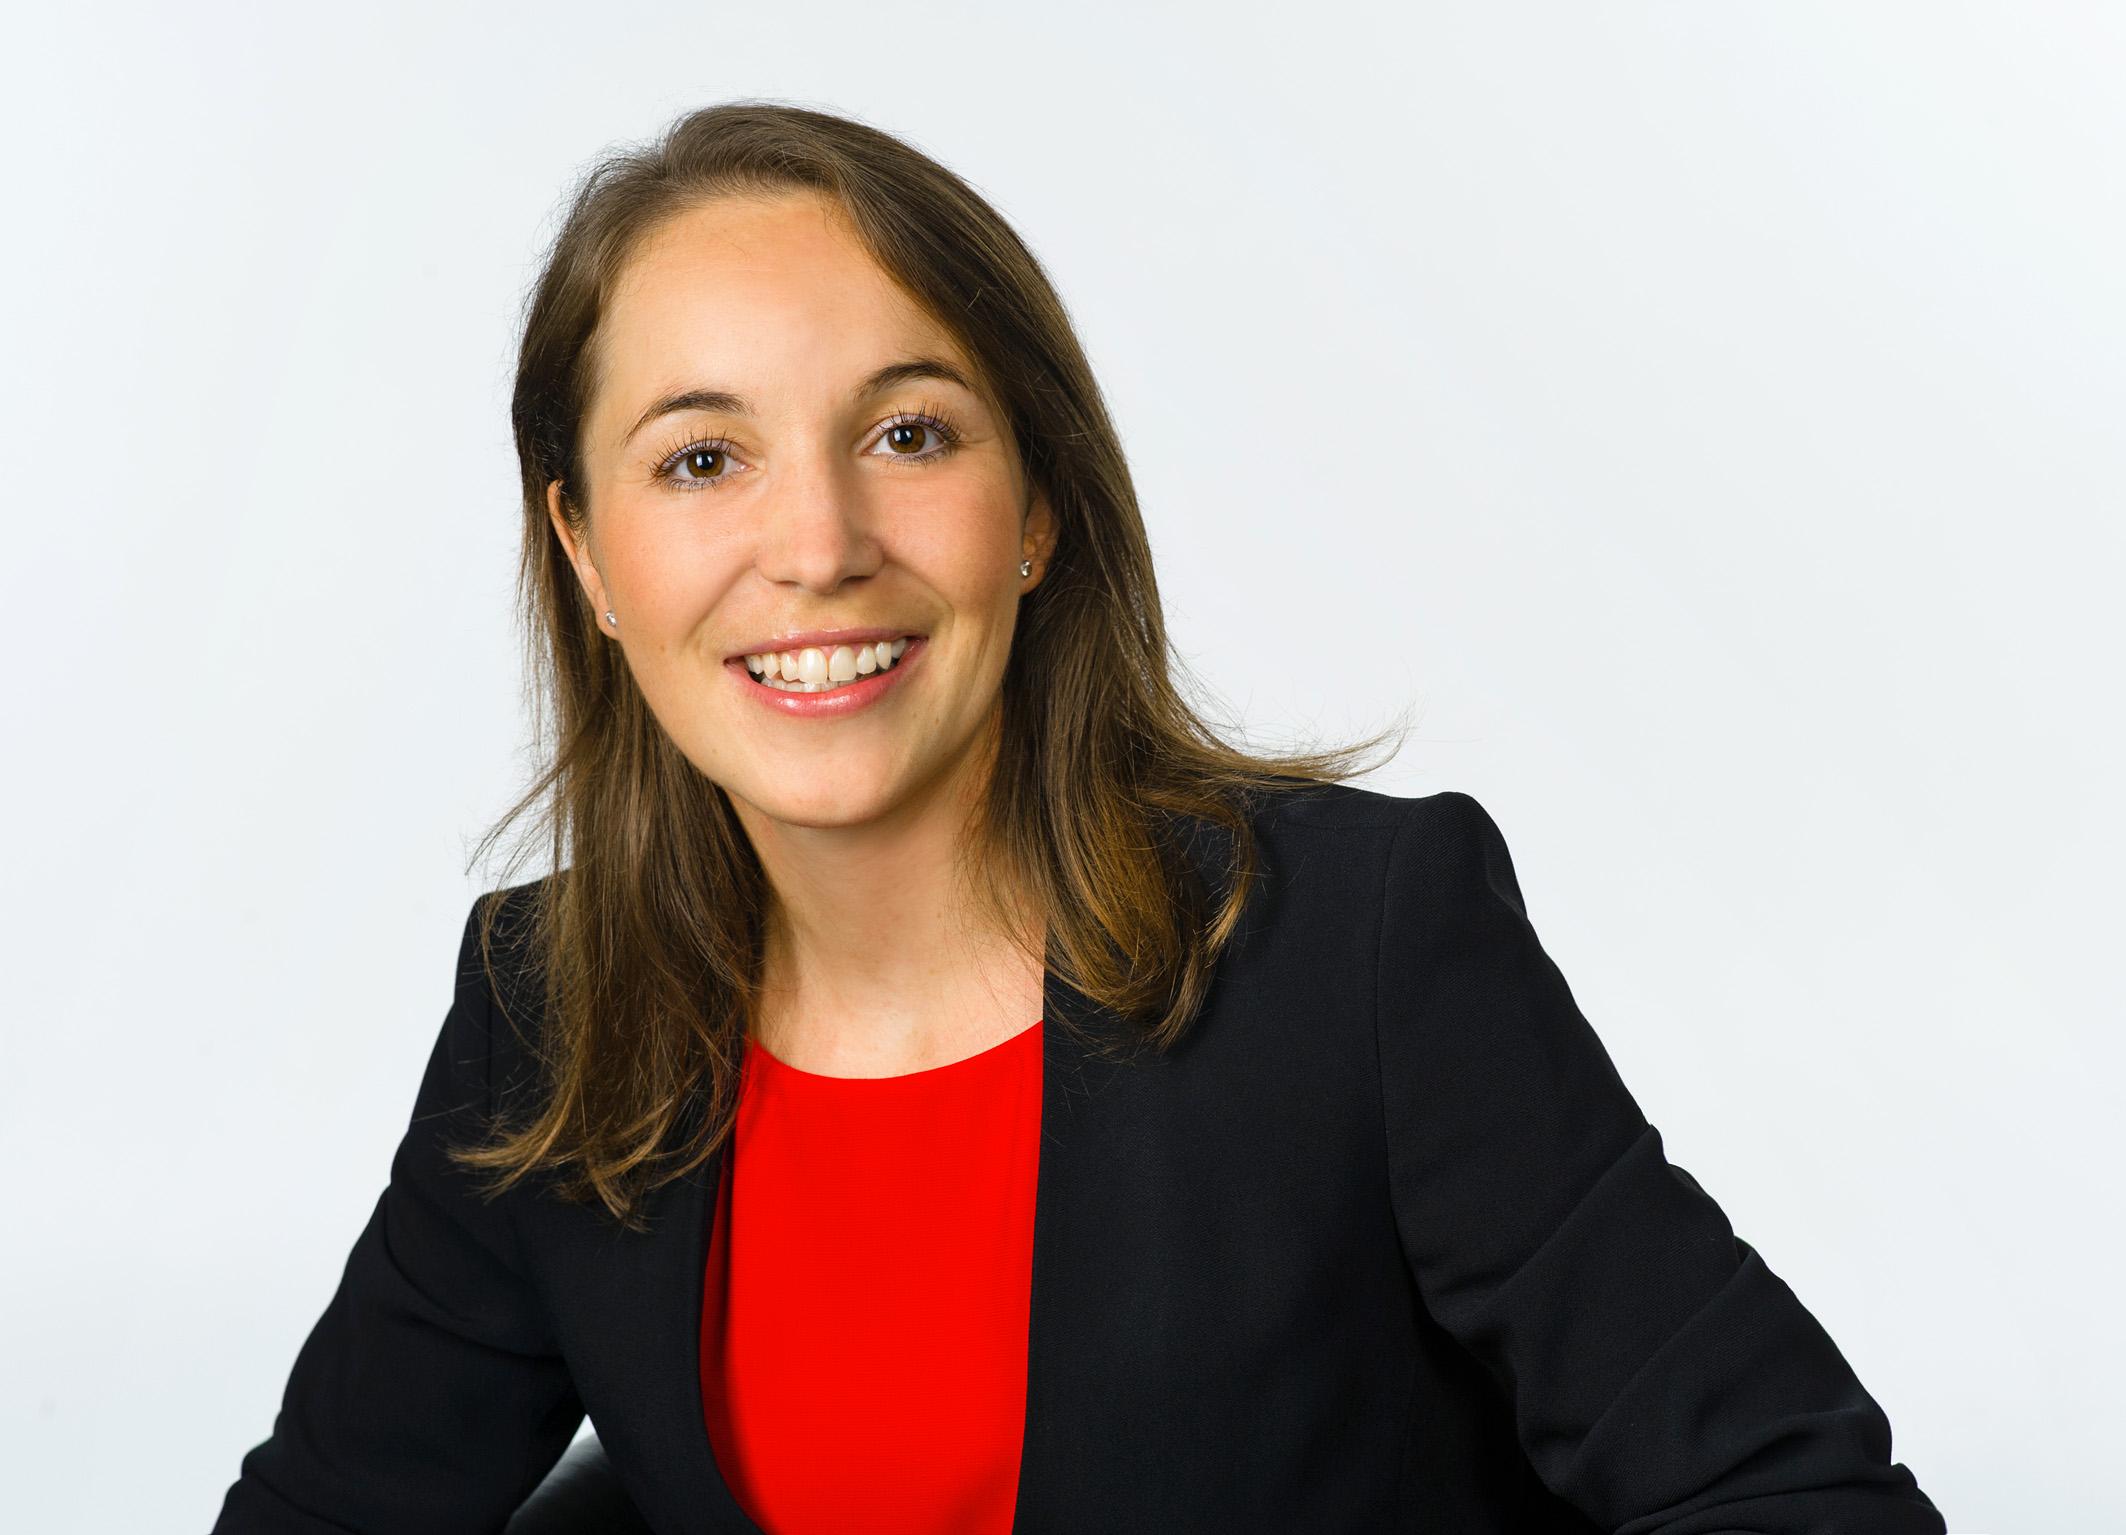 Michaela Leonhardt Profilbild